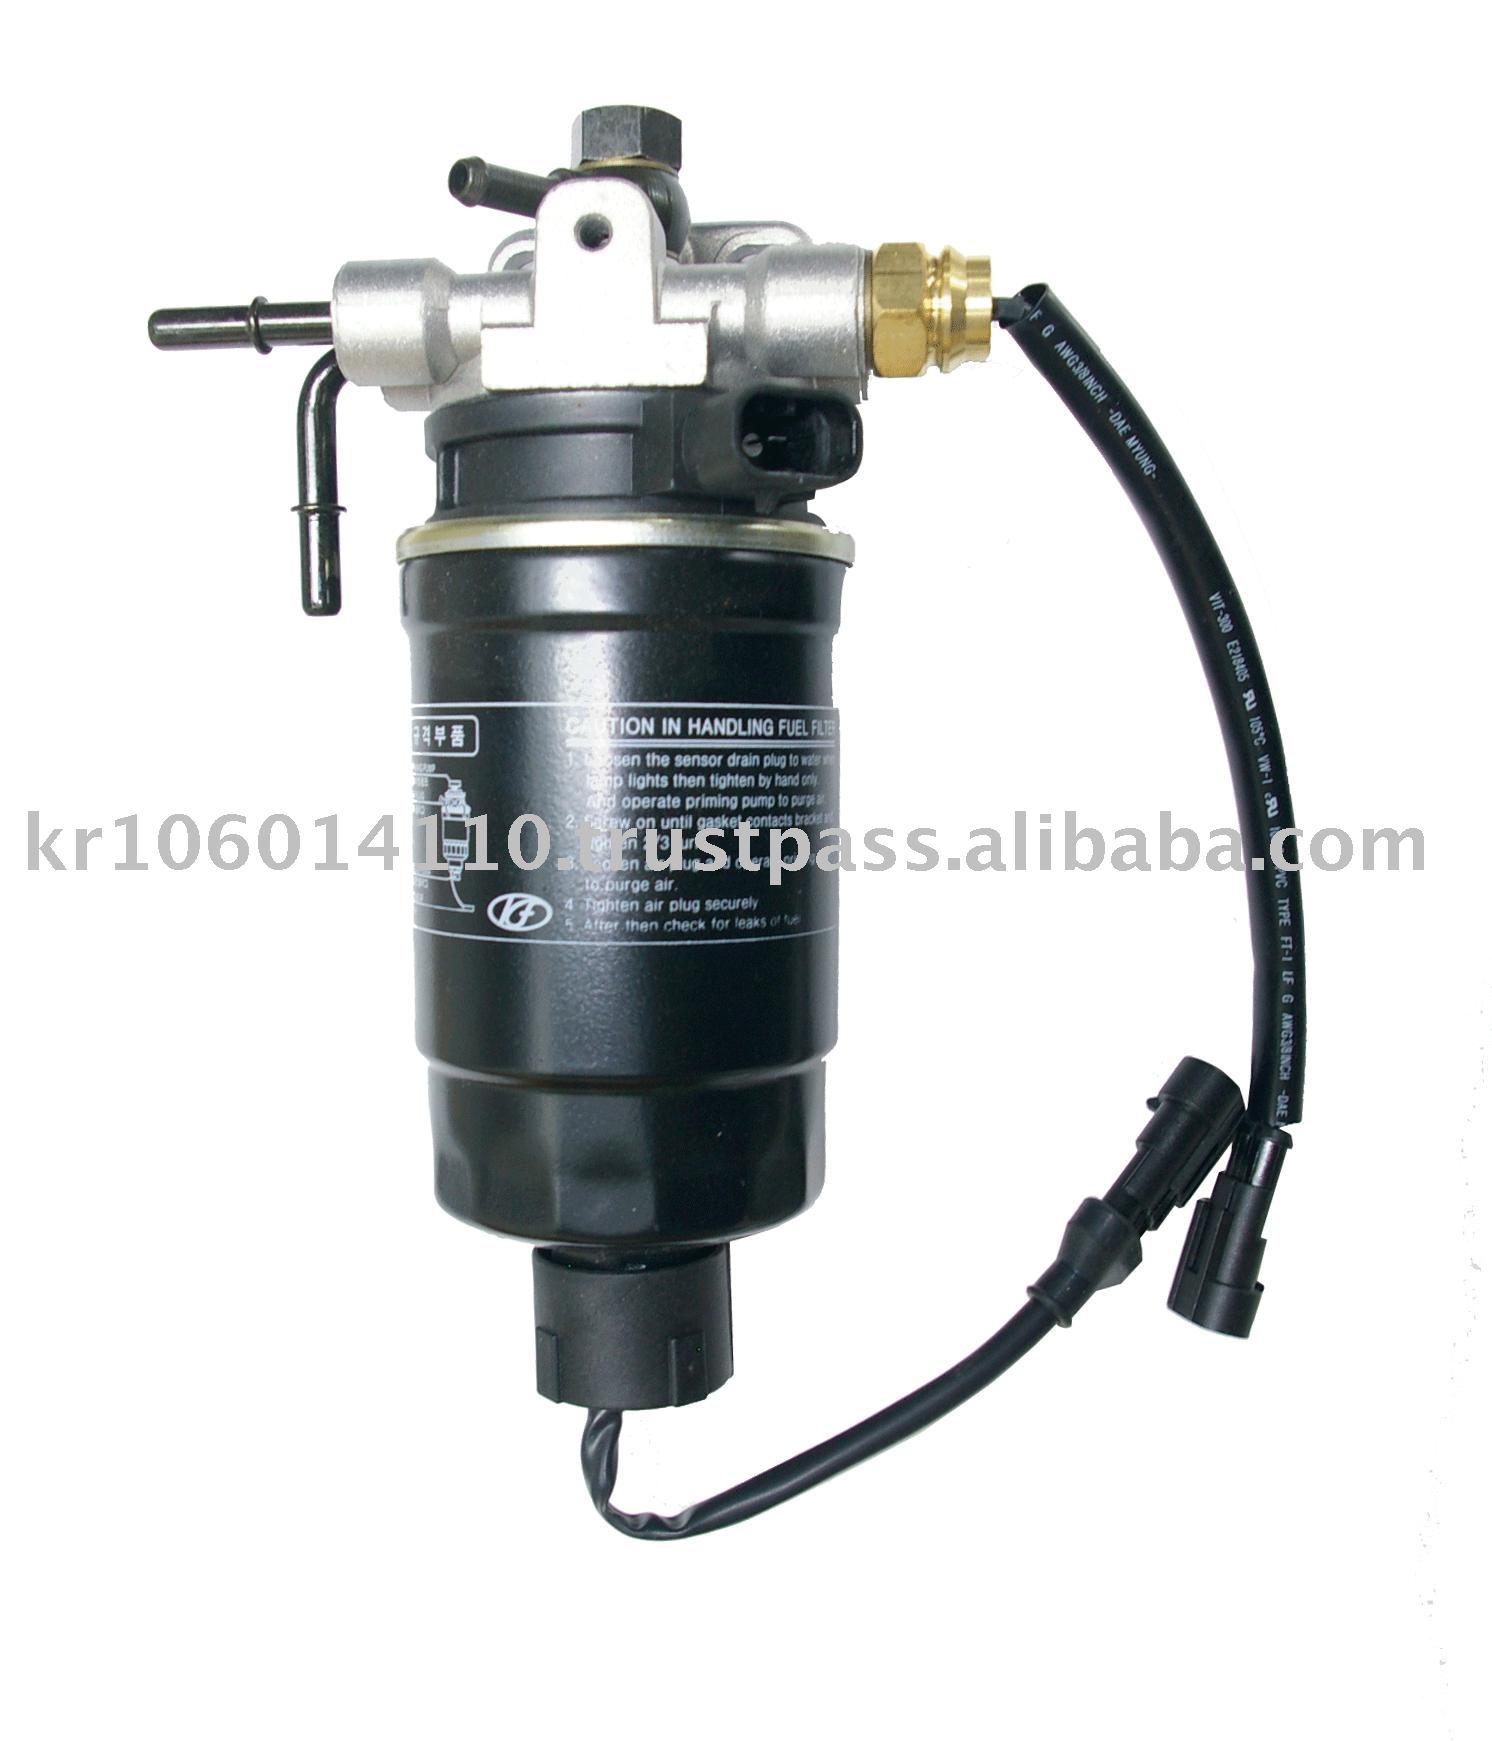 hight resolution of crdi fuel filter new sportage kia tucson hyundai